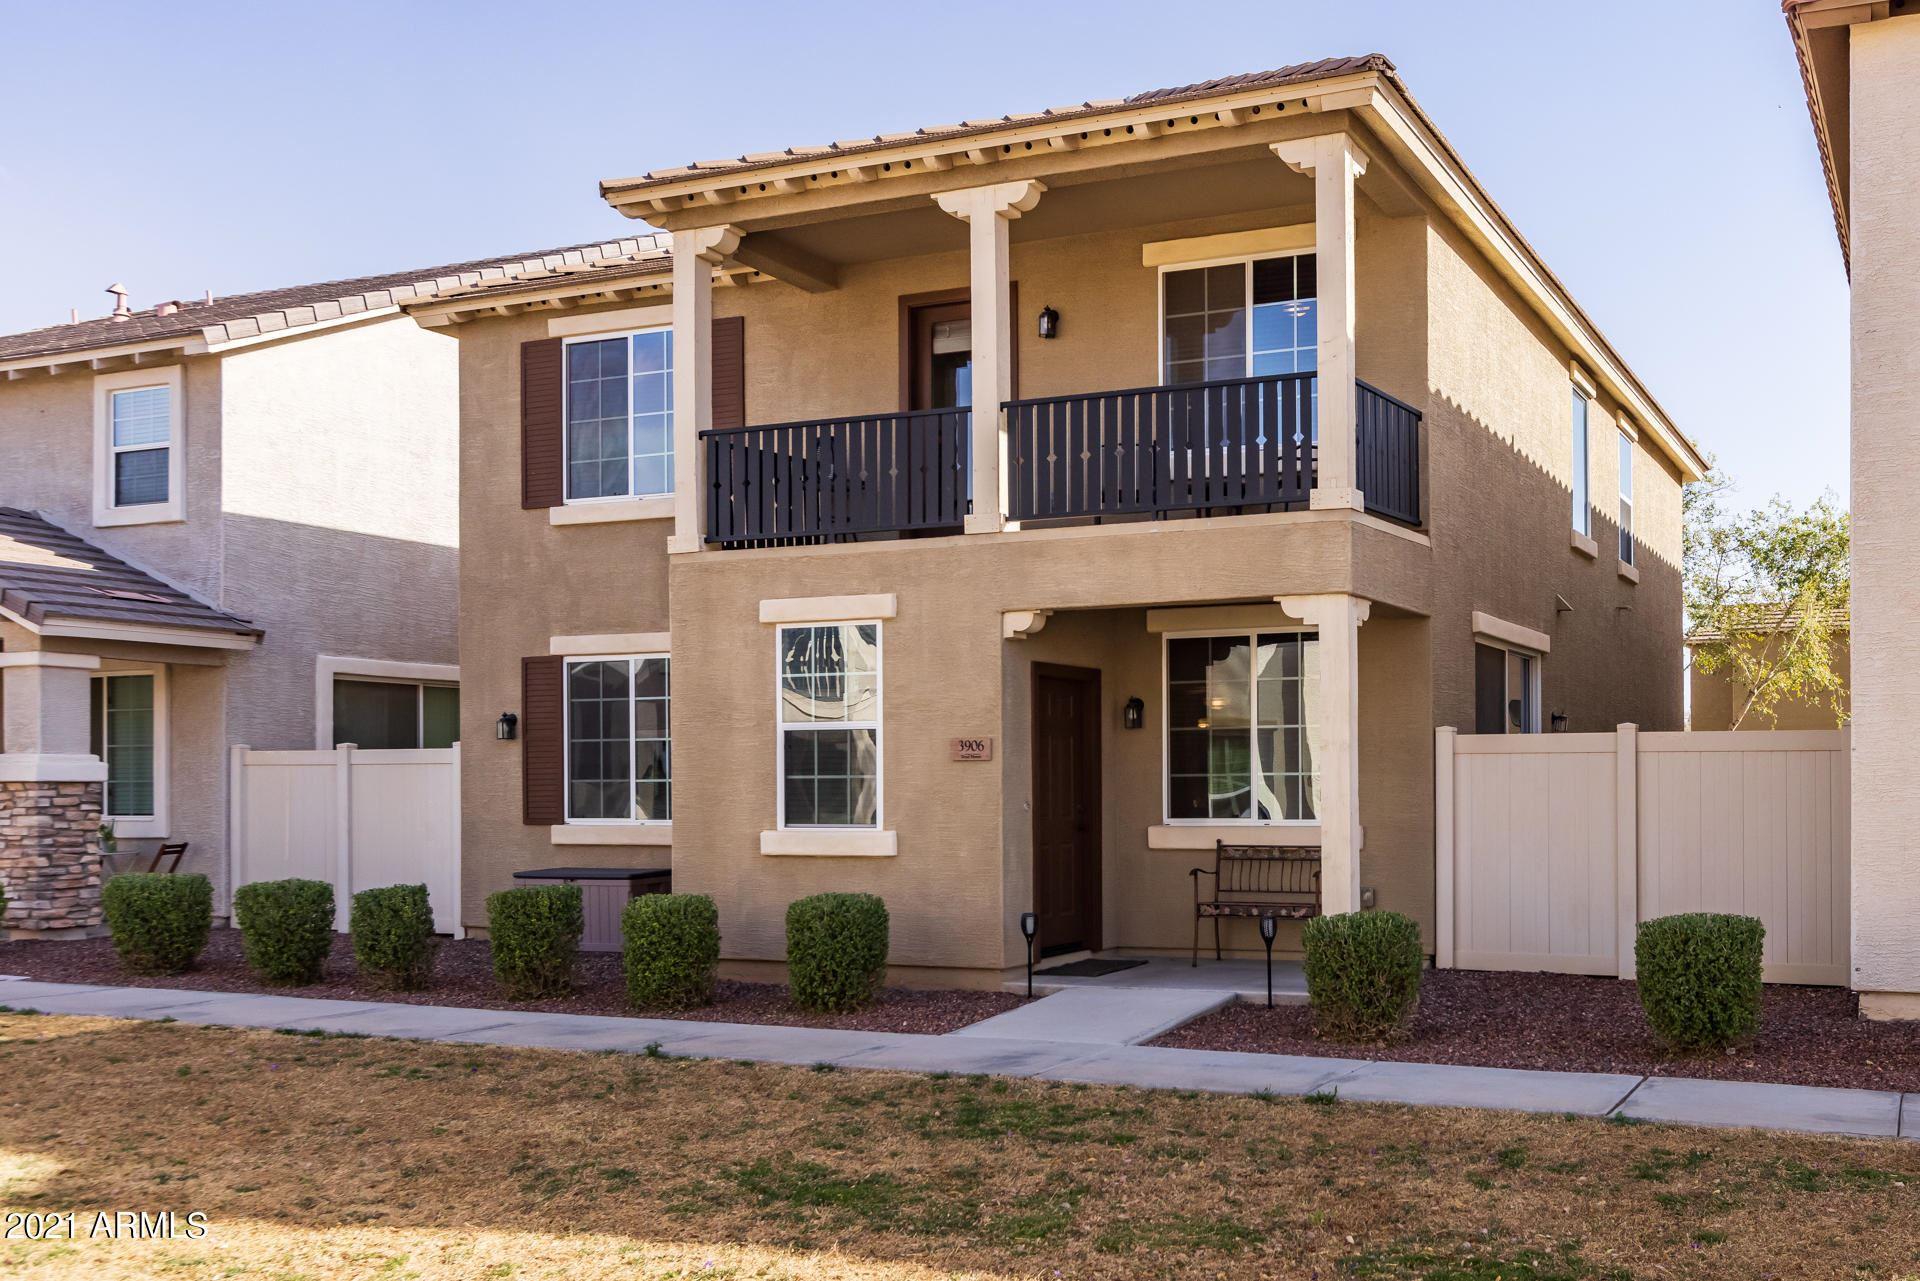 Photo of 3906 E LESLIE Drive, Gilbert, AZ 85296 (MLS # 6202620)